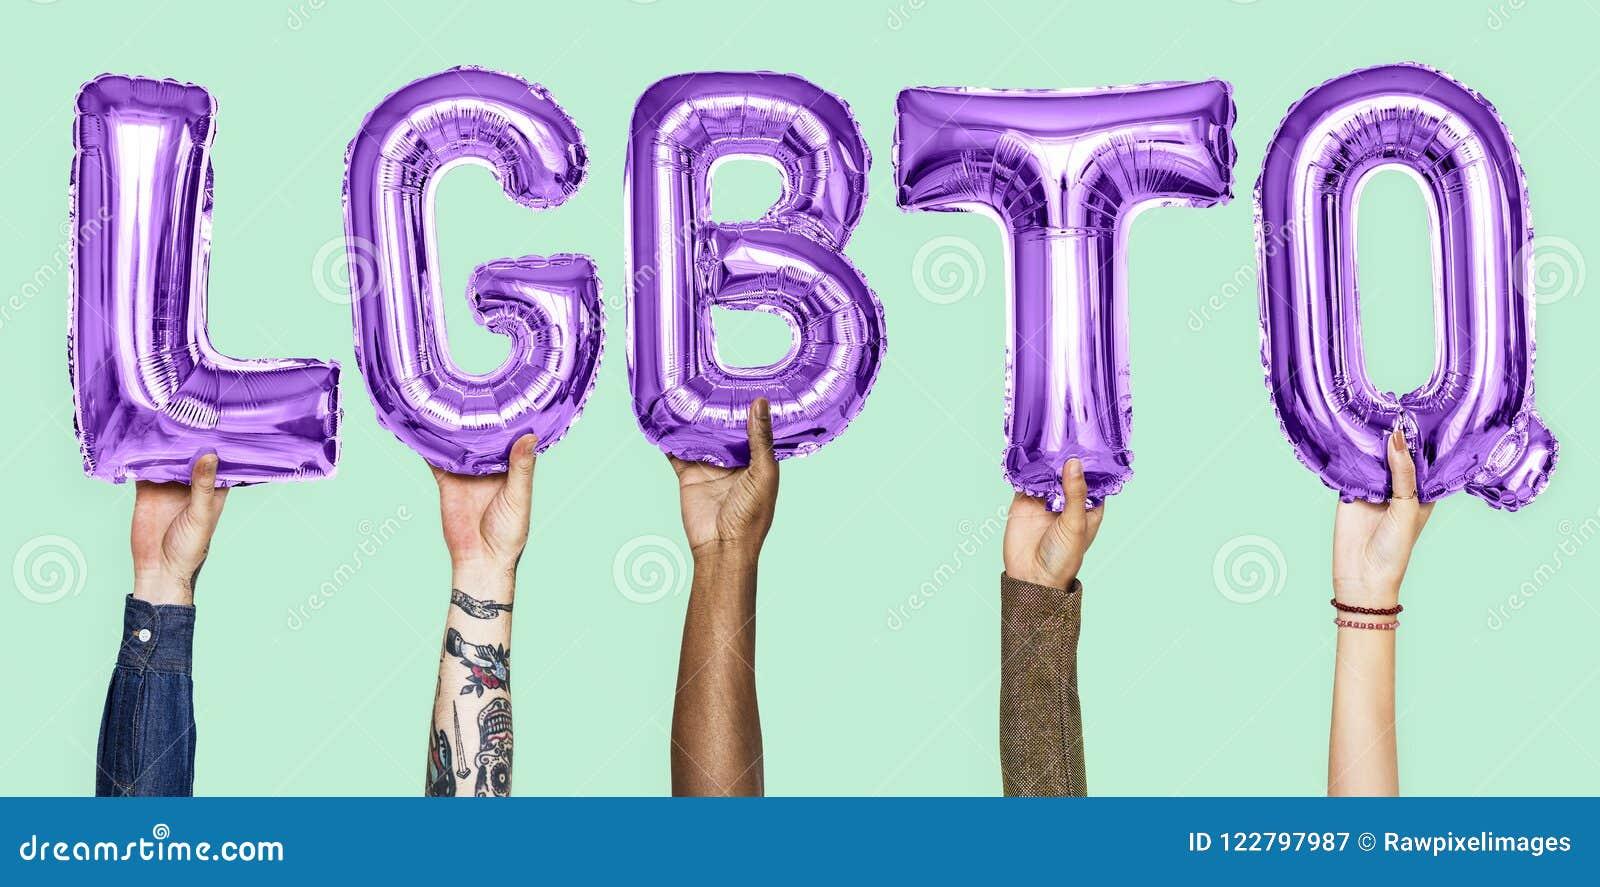 Purple alphabet balloons forming the word LGBTQ